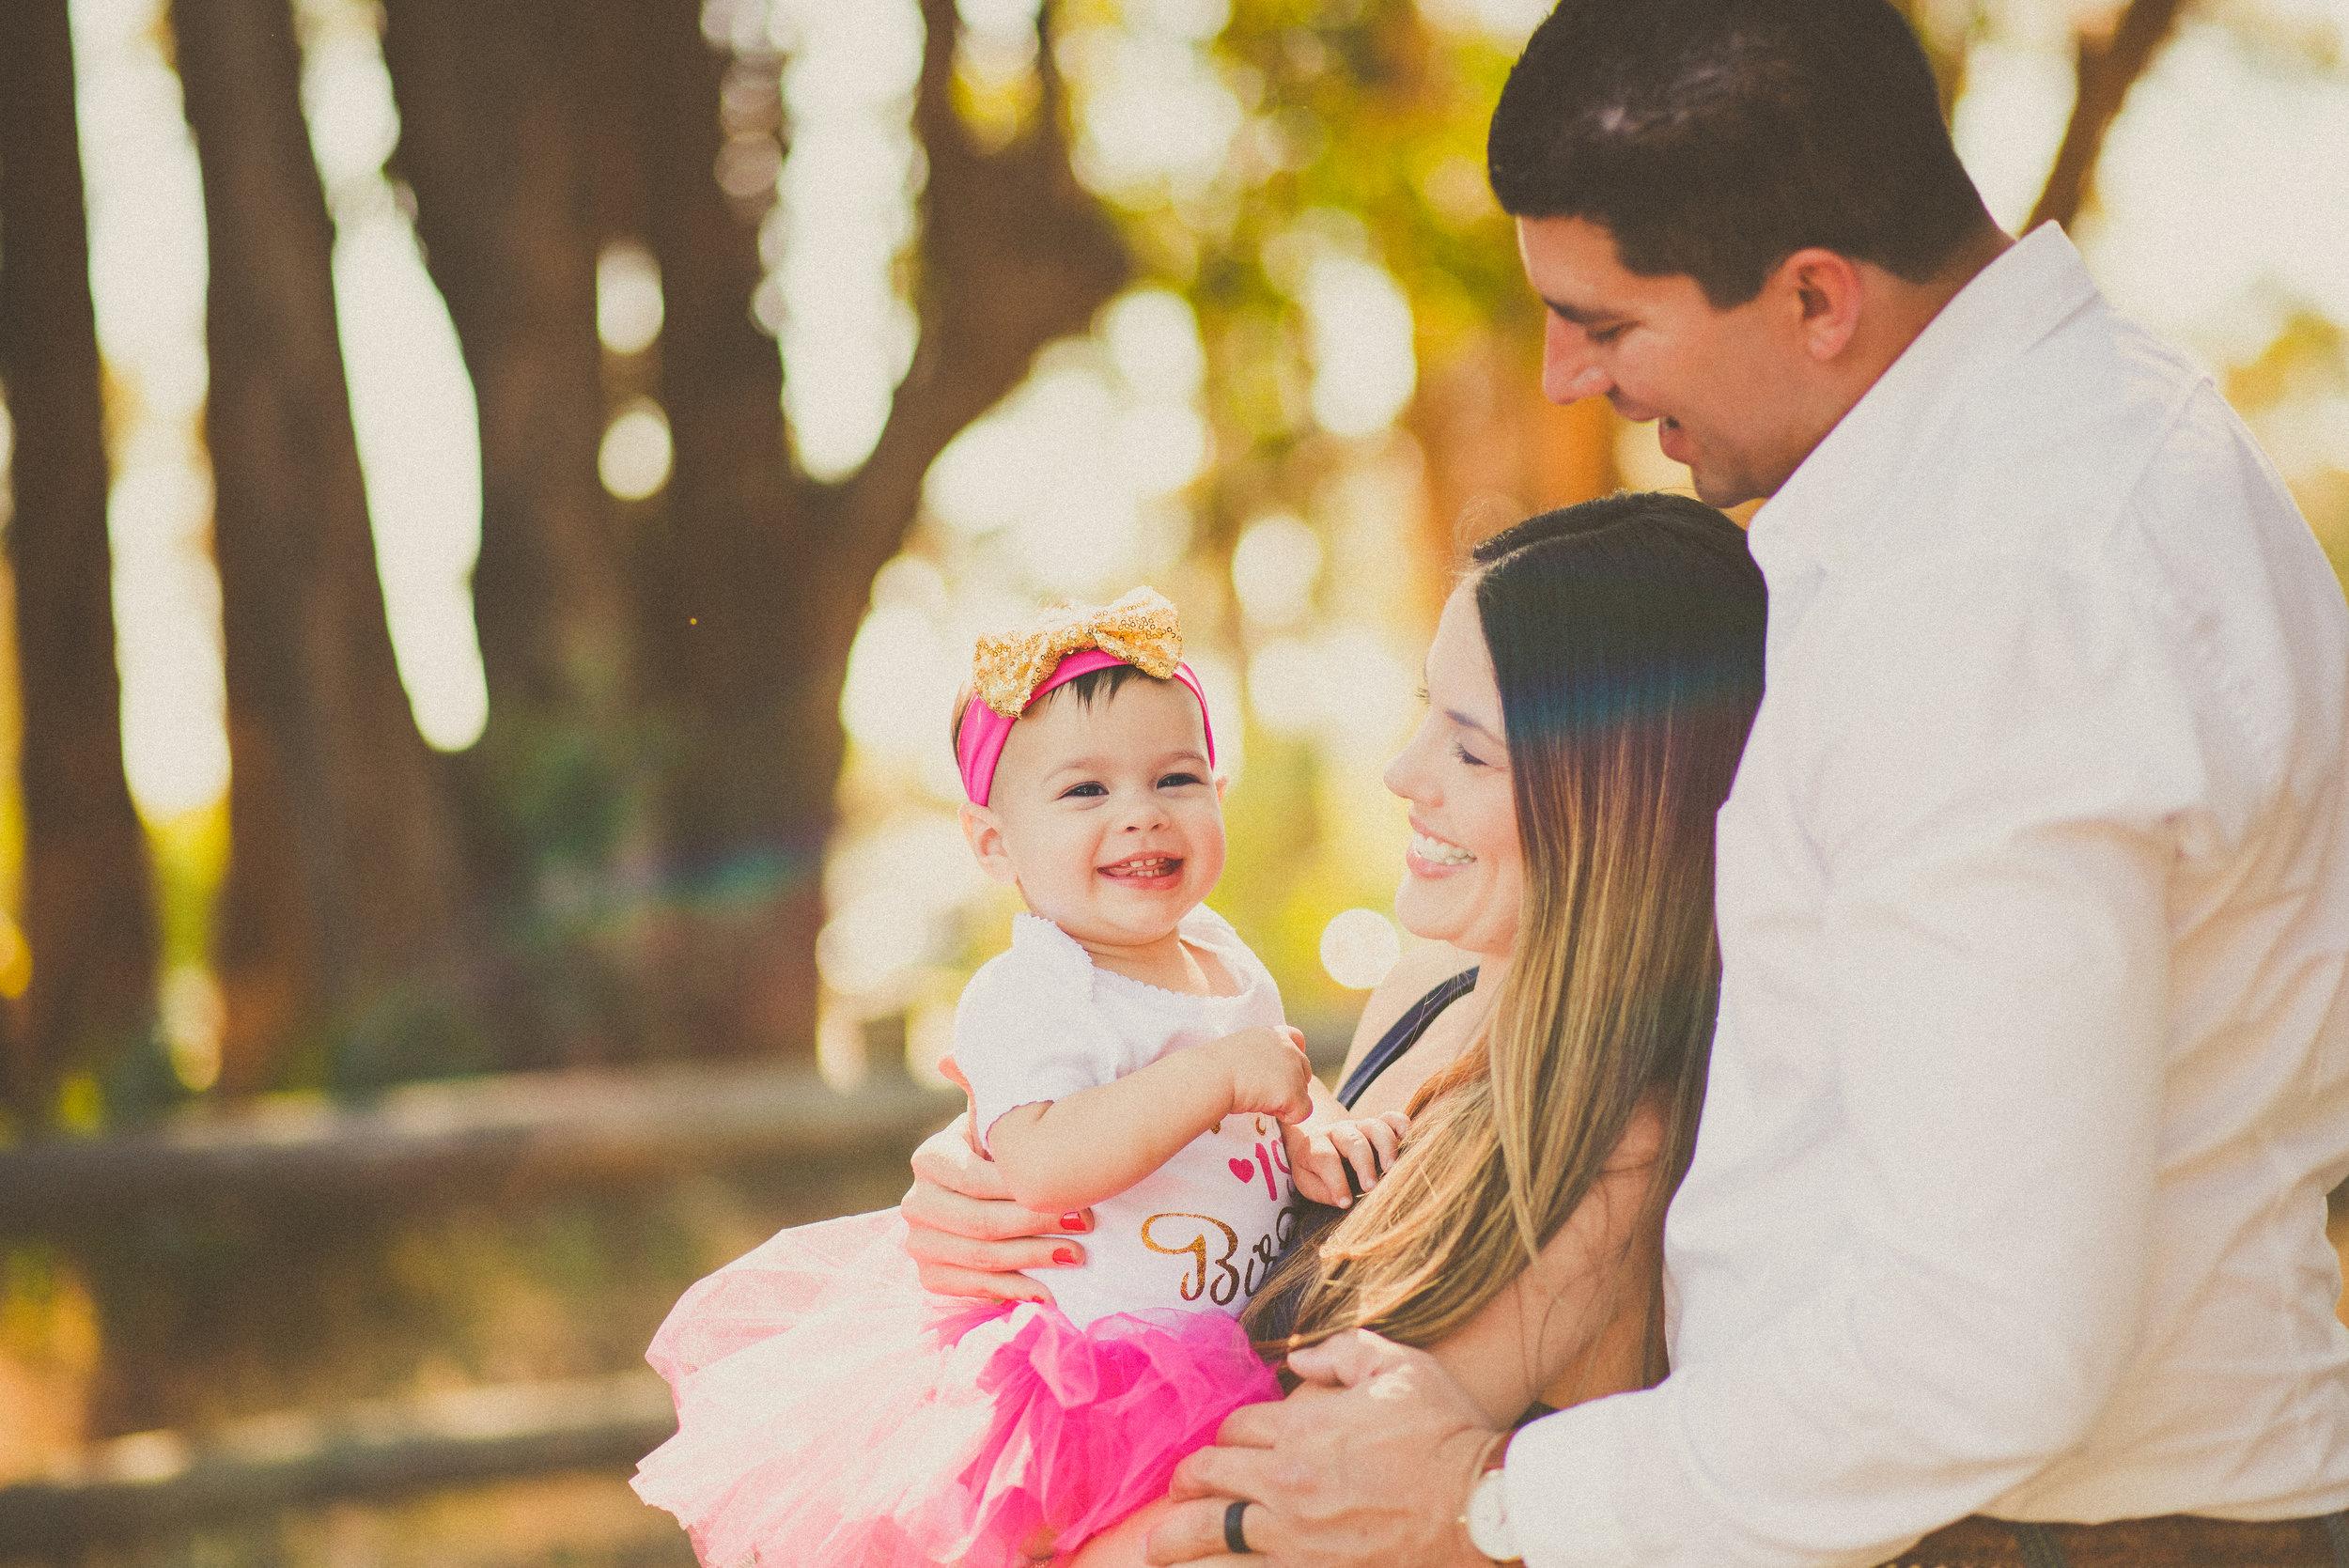 Holguin Family -- Reilynn's 1st Birthday-5.jpg